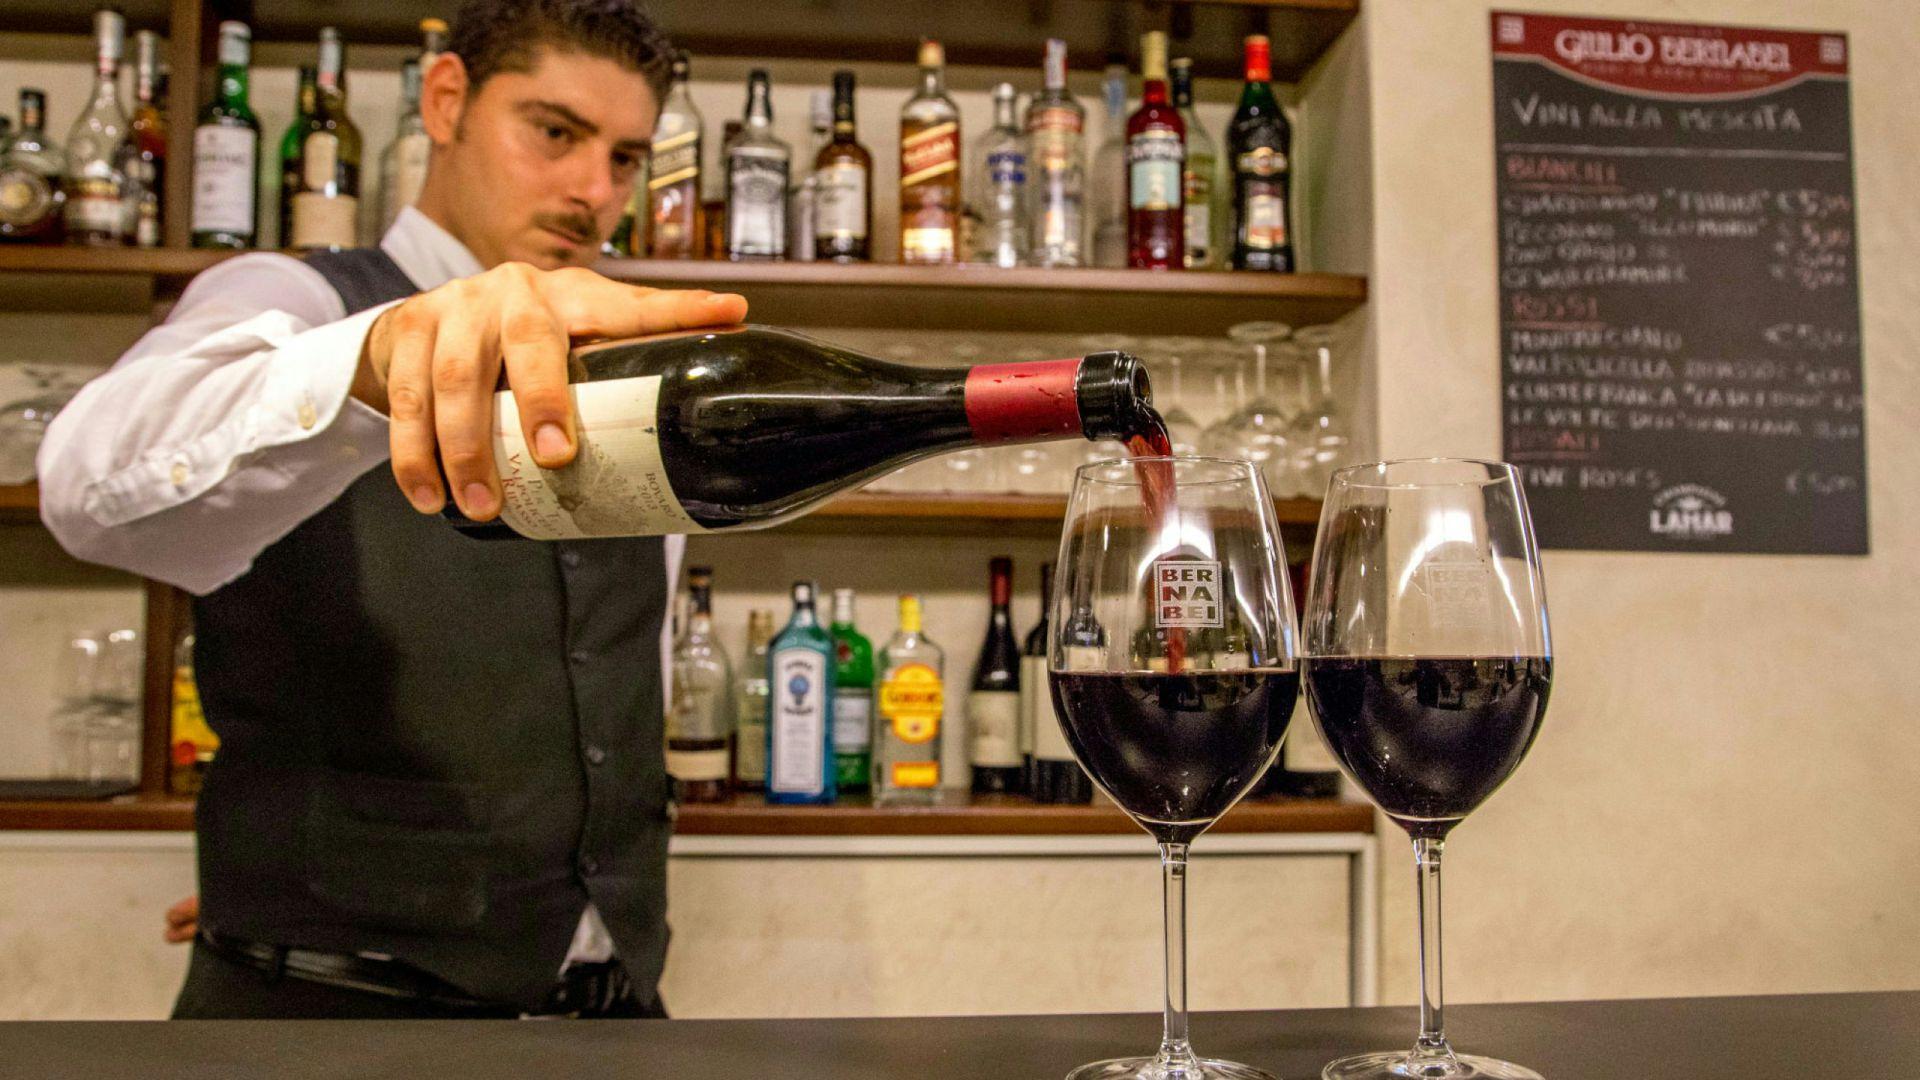 Foto-Hotel-Oxford-Roma-bar-de-vinhos-18